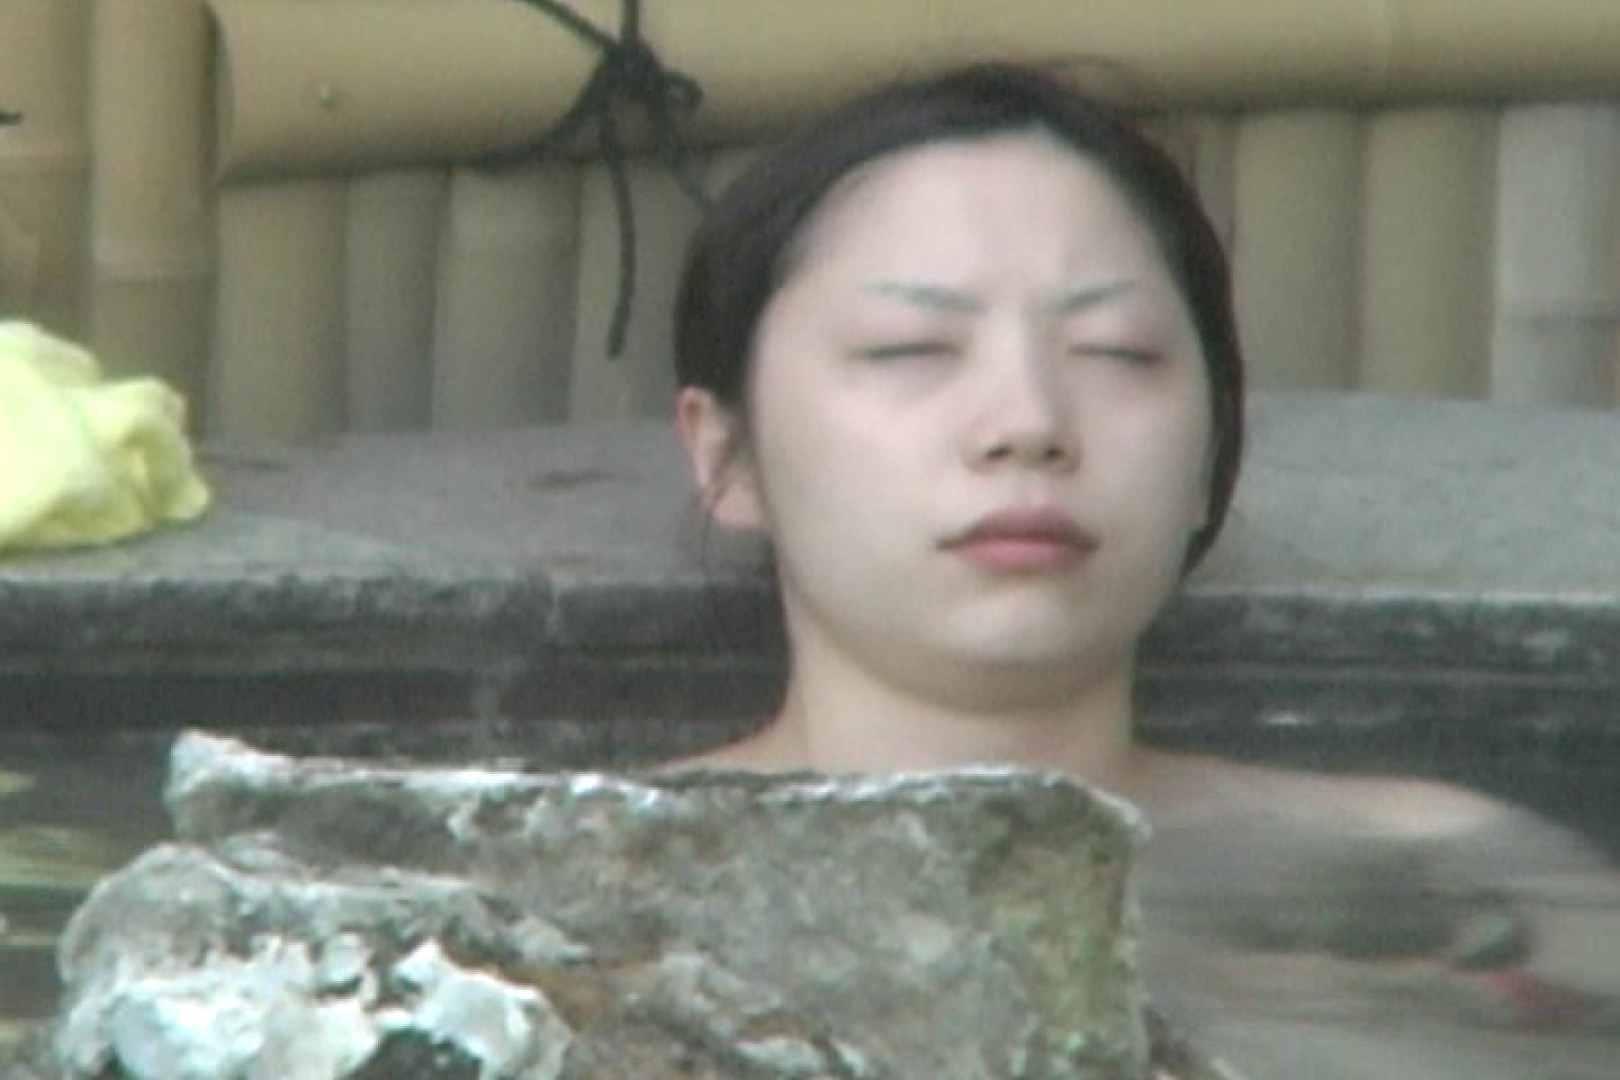 Aquaな露天風呂Vol.596 OLセックス  77画像 51